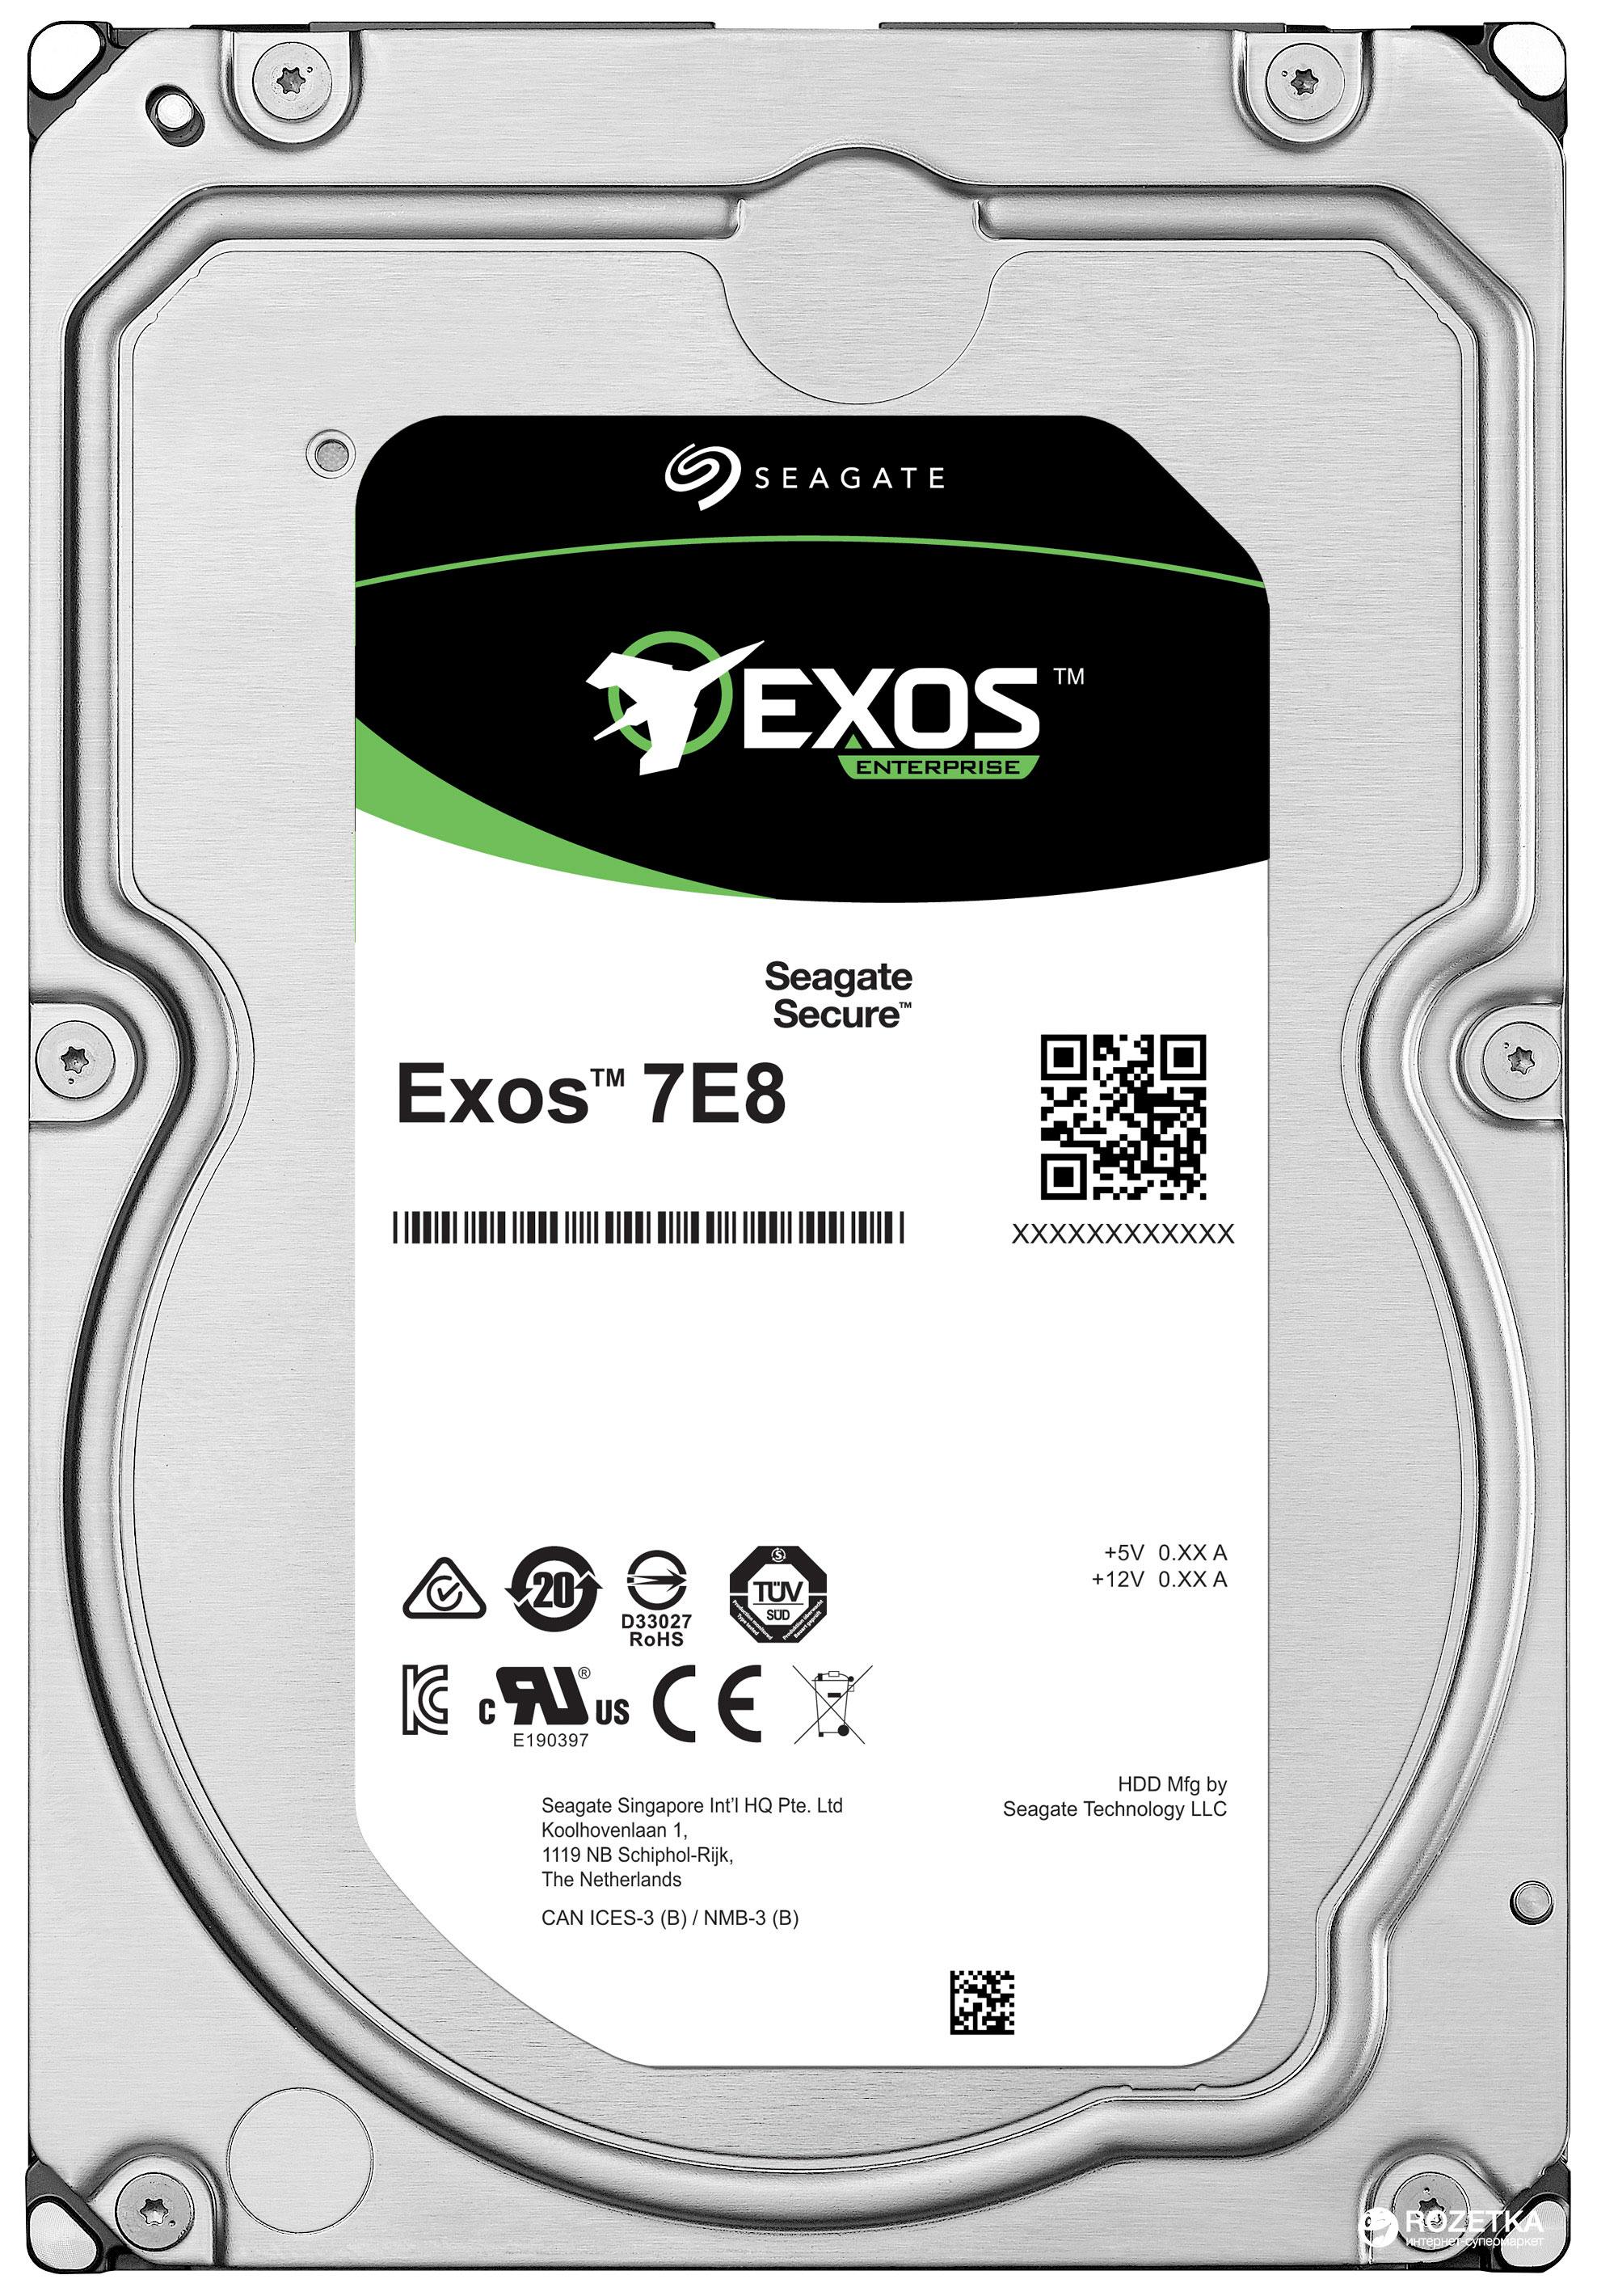 Seagate 1TB Exos 7E8 SAS 3.5 Internal HDD